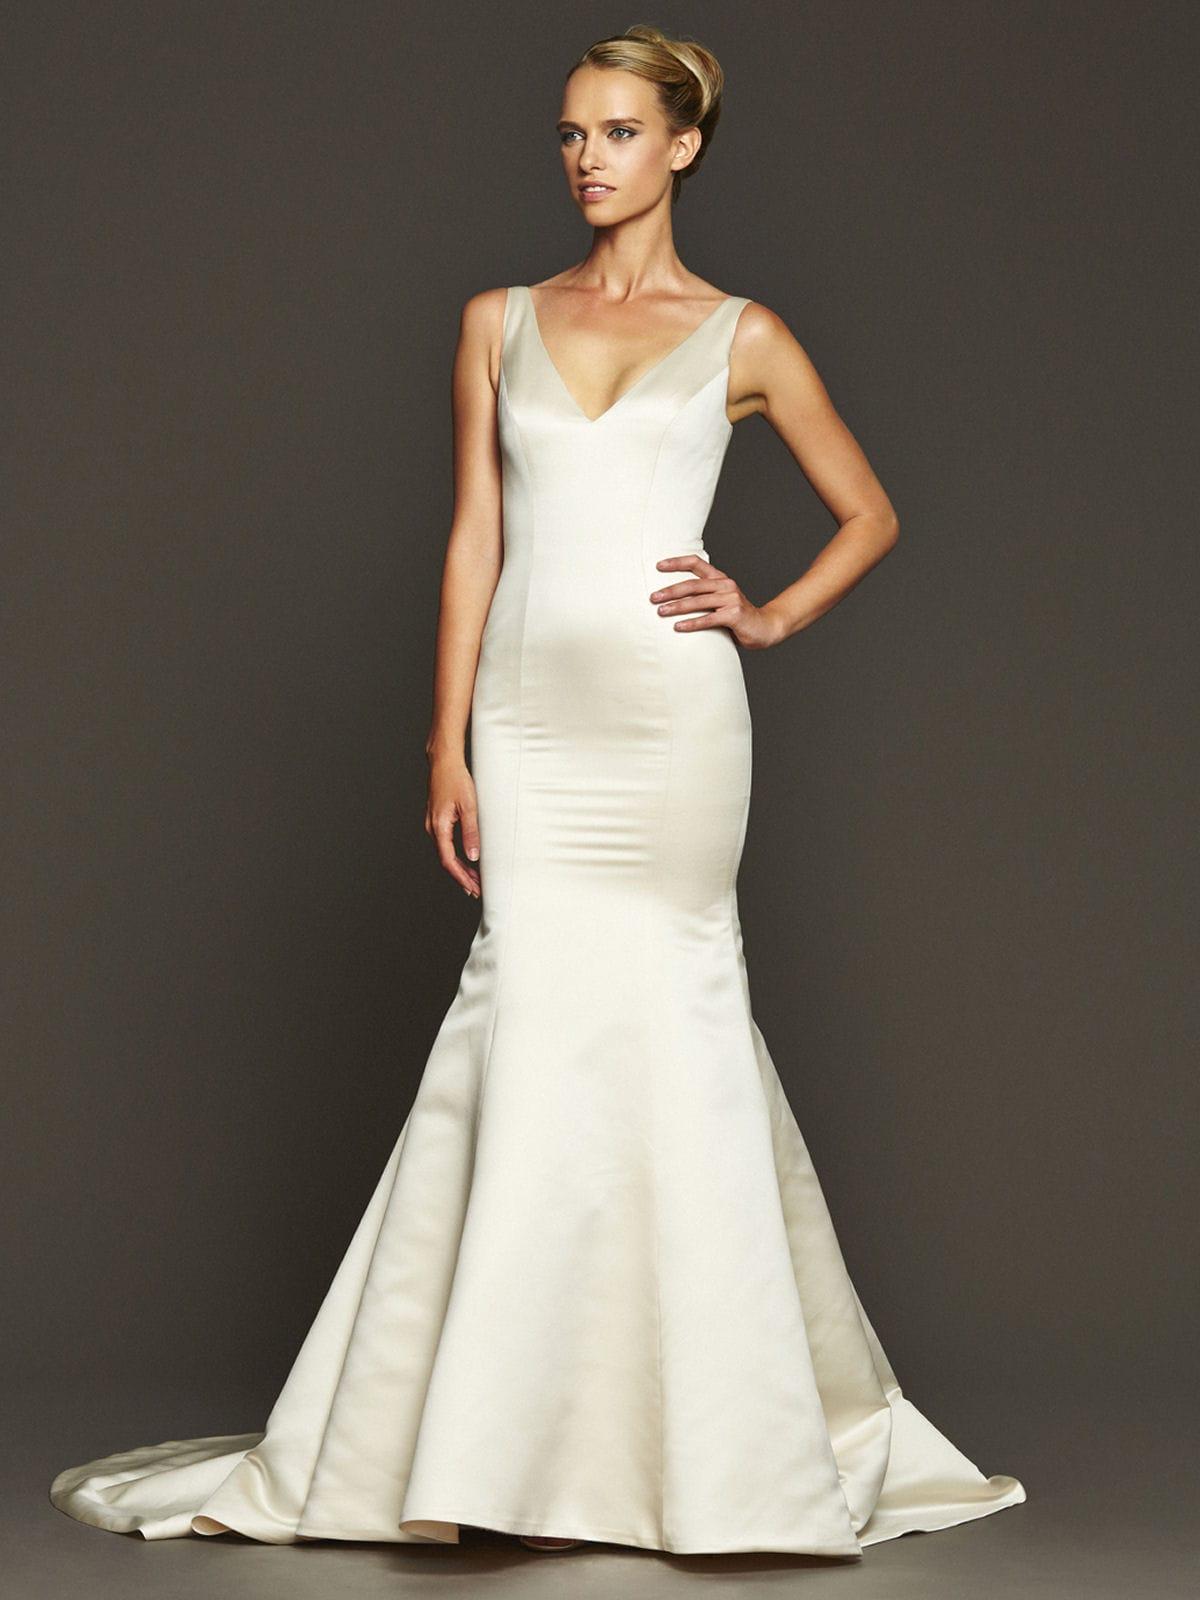 Badgley mischka sell my wedding dress online sell my for Buy designer wedding dresses online